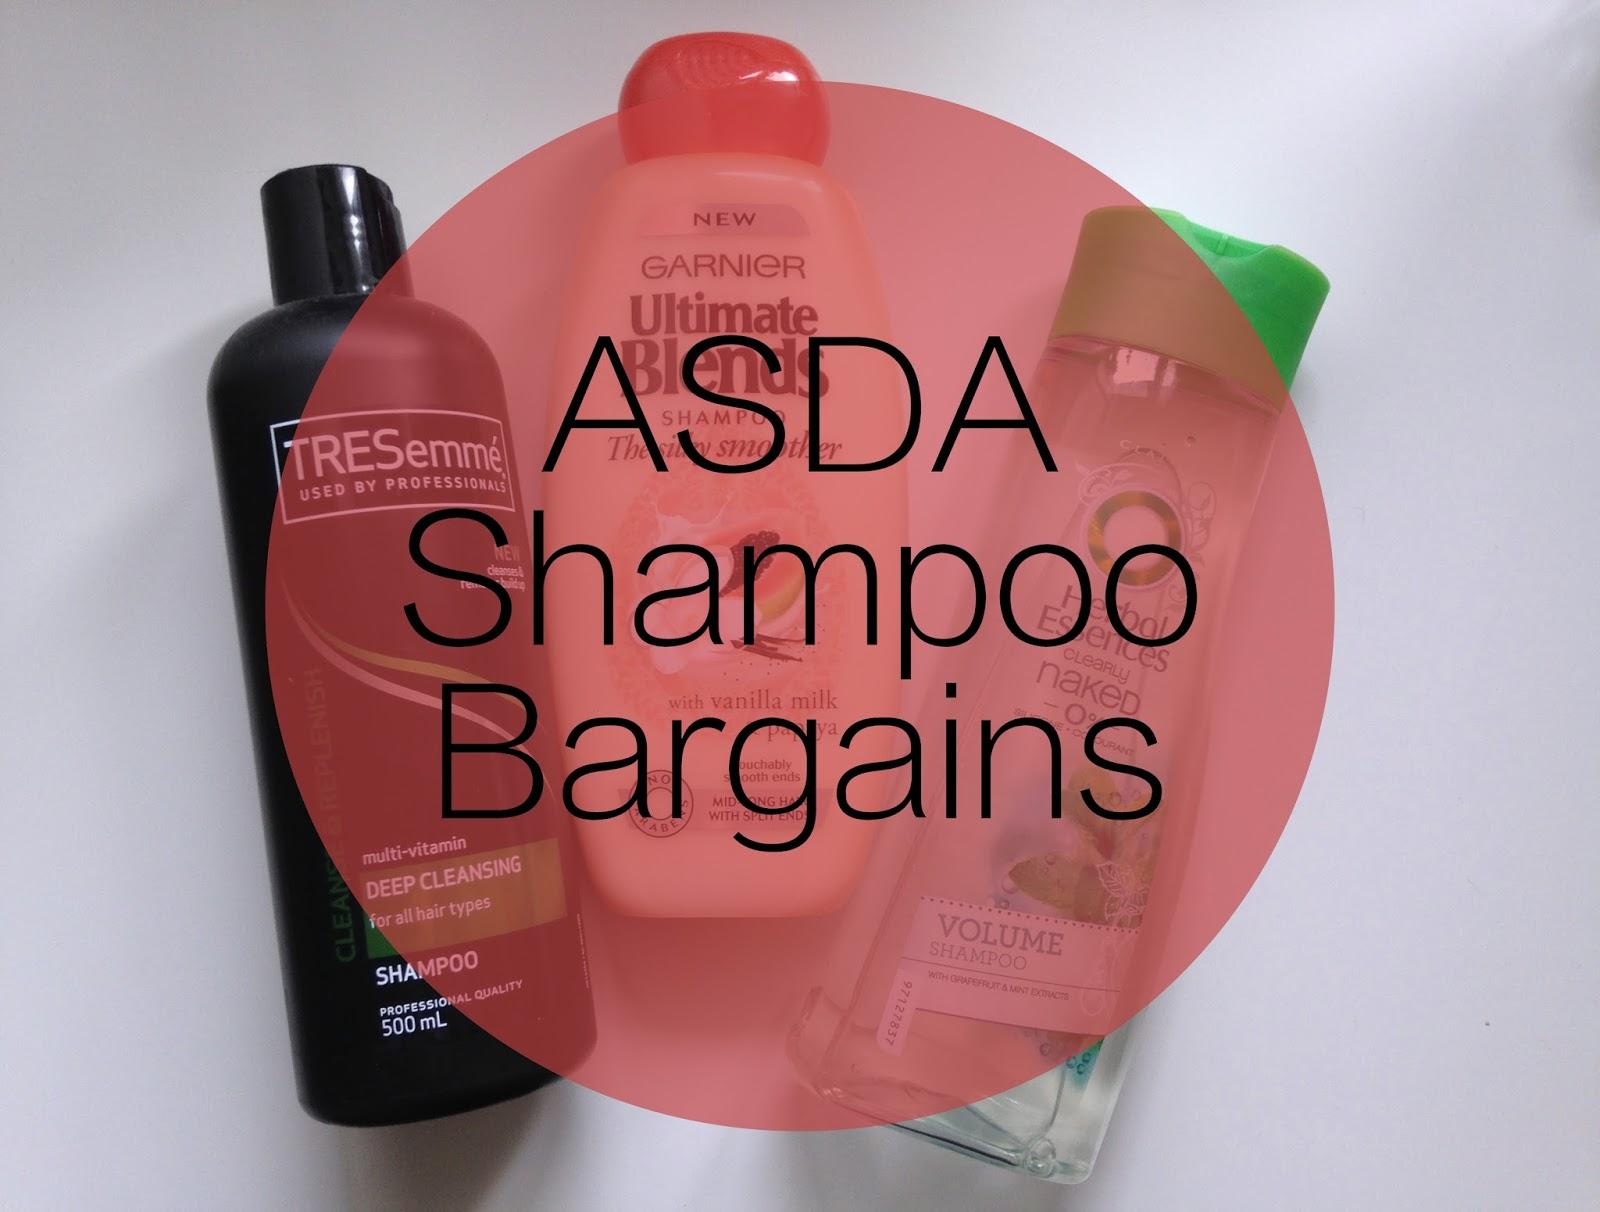 Tresemme Deep Cleansing Shampoo Garnier Ultimate Blends Herbal Essence Naked 0%volume shampoo